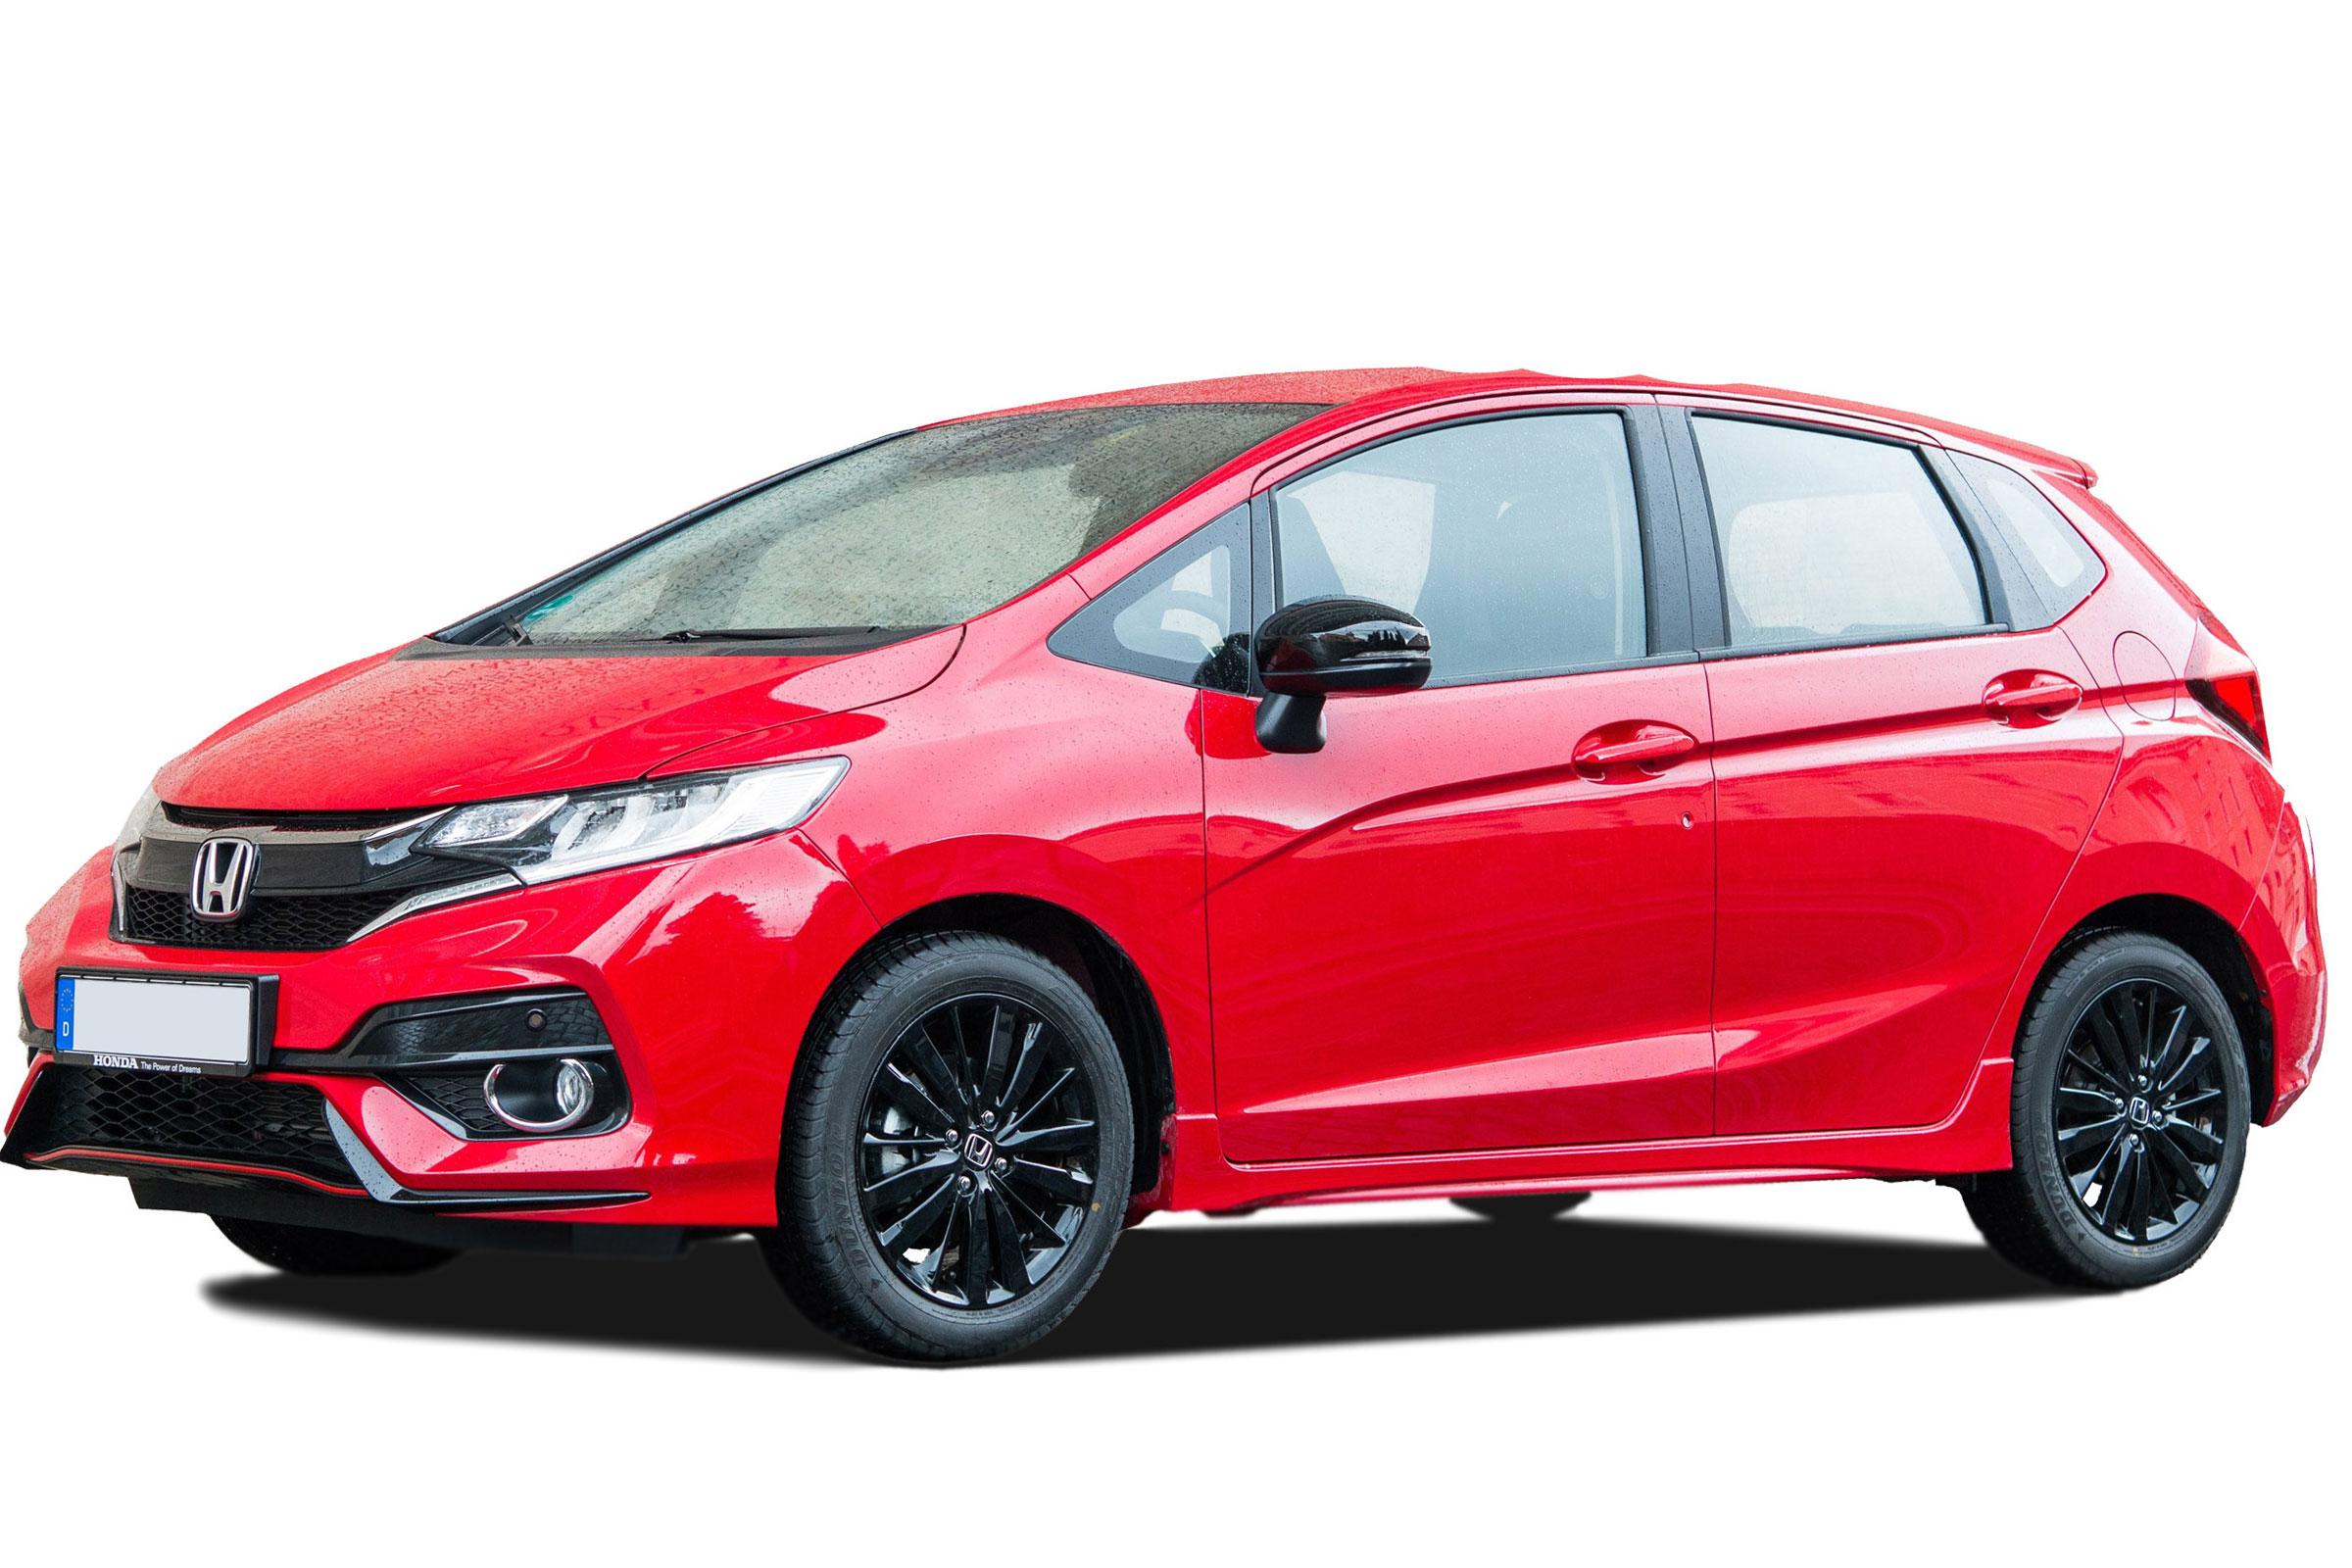 Honda Jazz Hatchback 2015 2020 Owner Reviews Mpg Problems Reliability Carbuyer